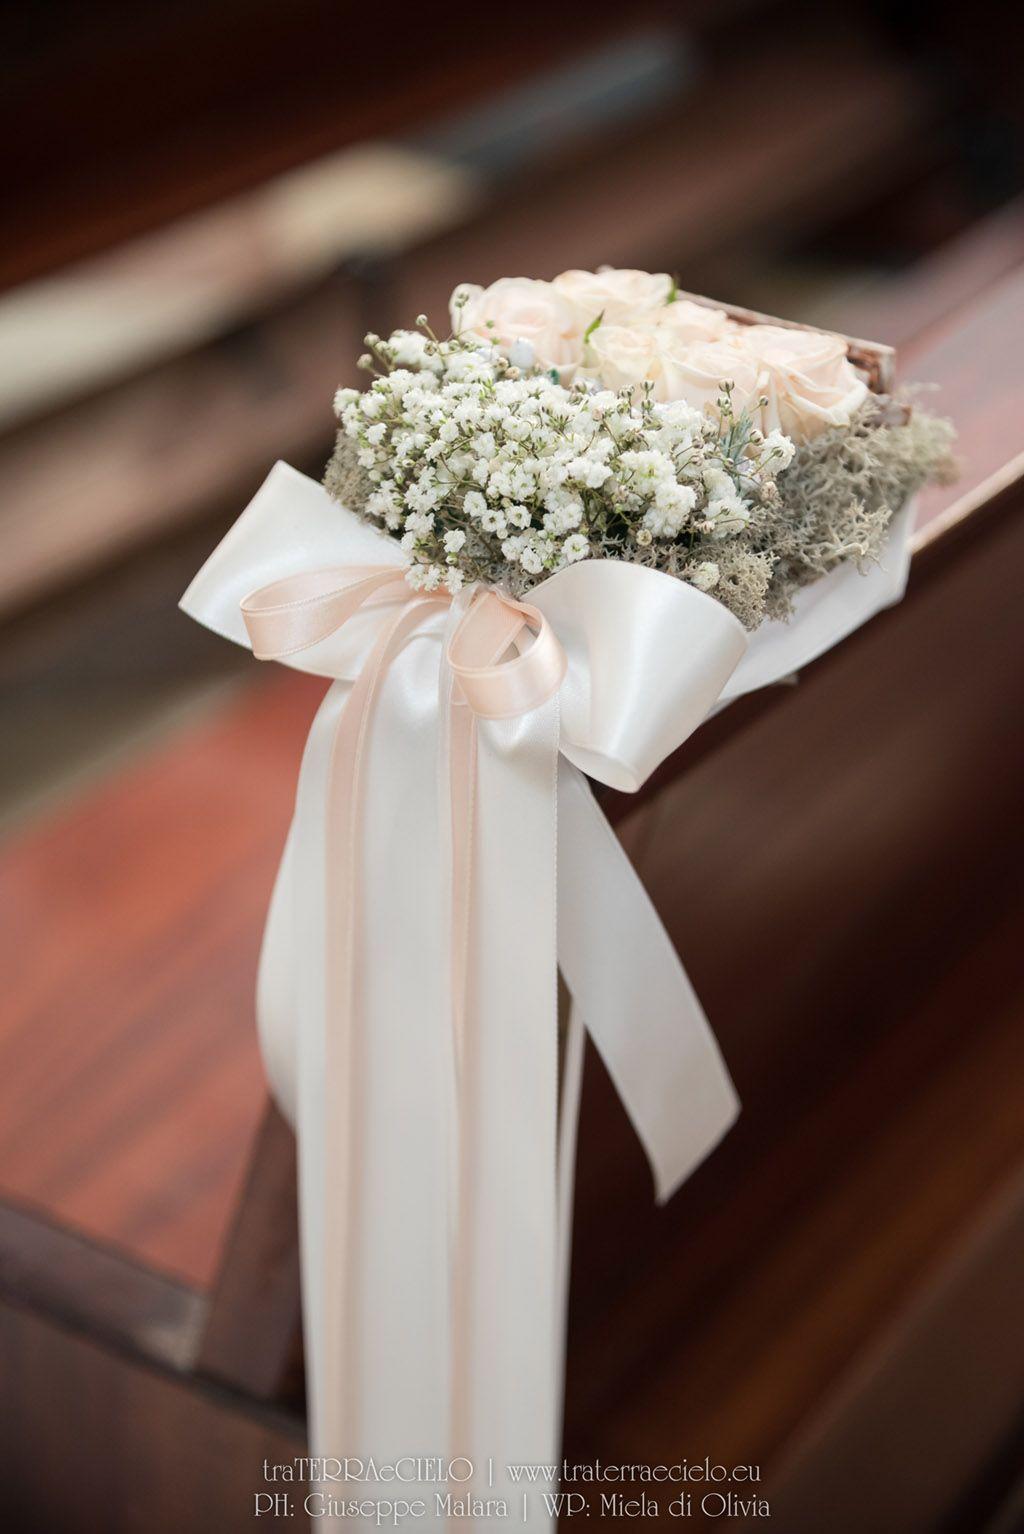 Bouquet Natalizio Matrimonio : Matrimonio inverno sposa sposo portafedi tableau de mariage